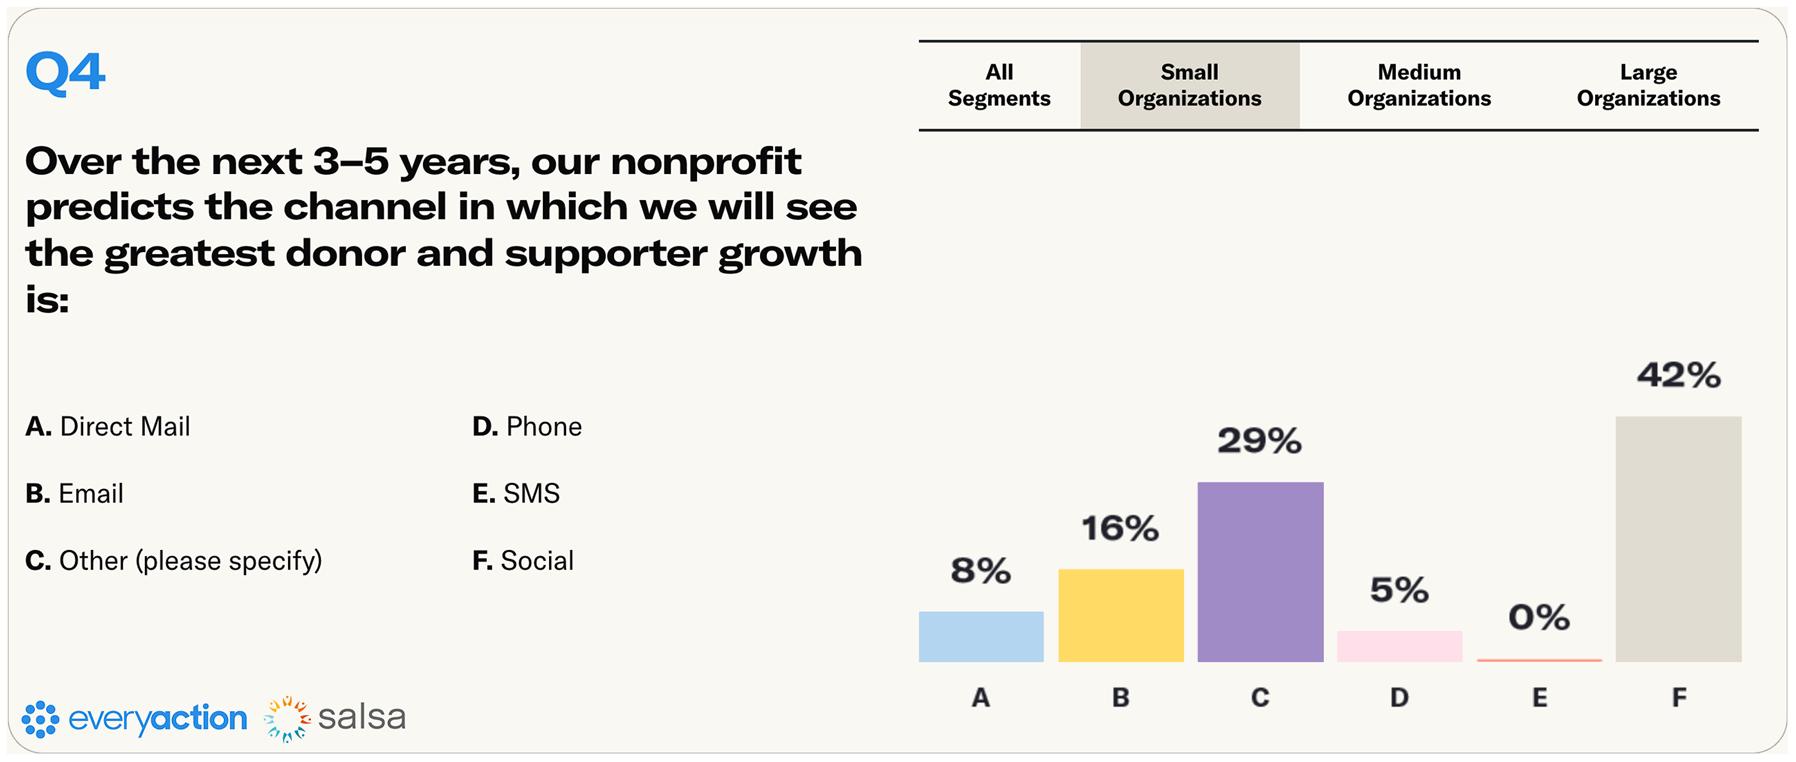 Nonprofit Fundraising Survey Q4 Small Nonprofits Image